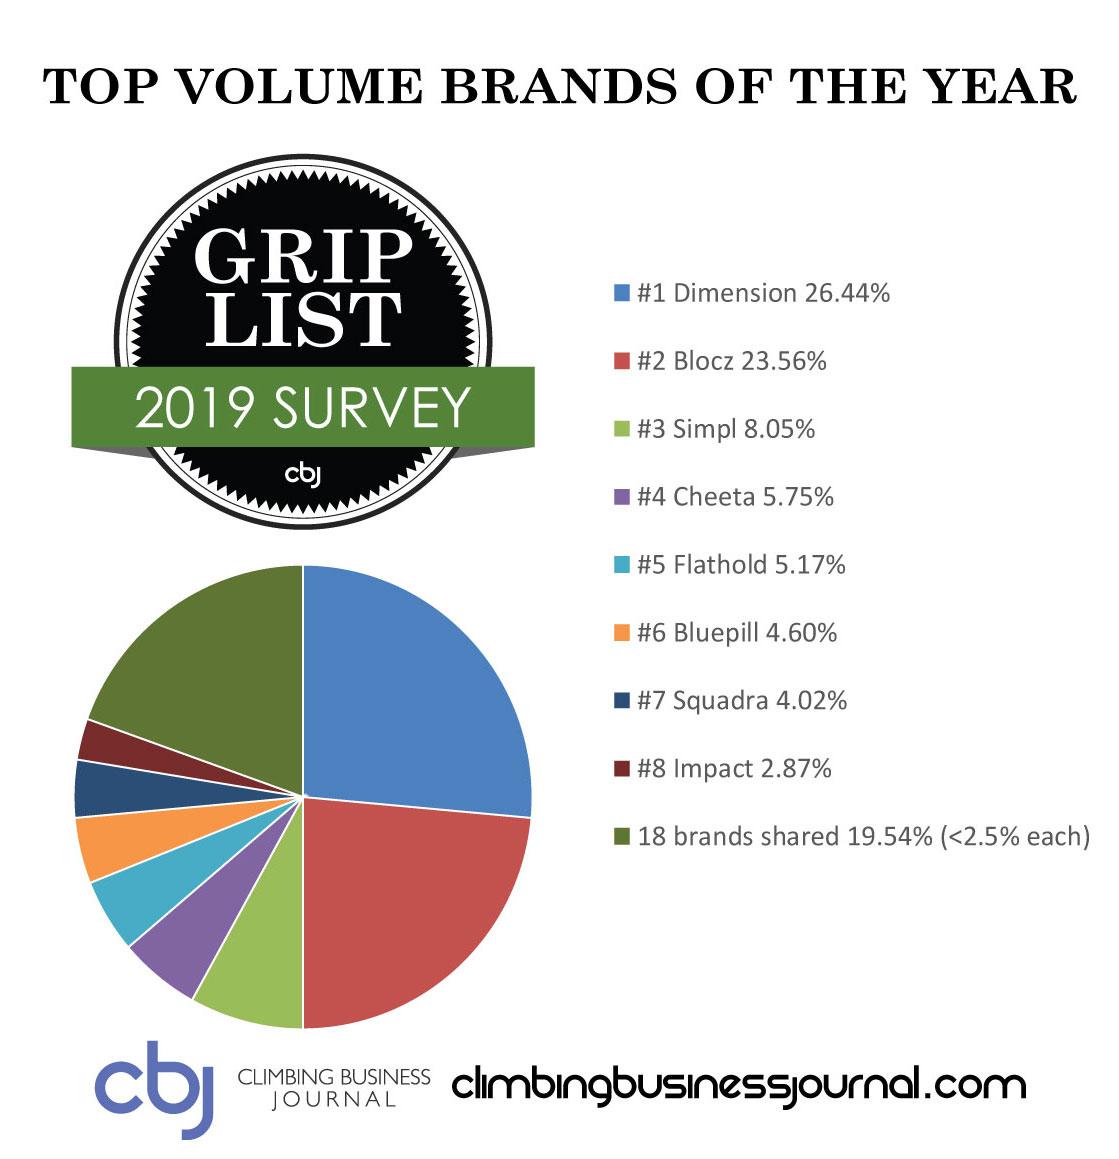 2019 CBJ Grip List Volume Brands by Percentage